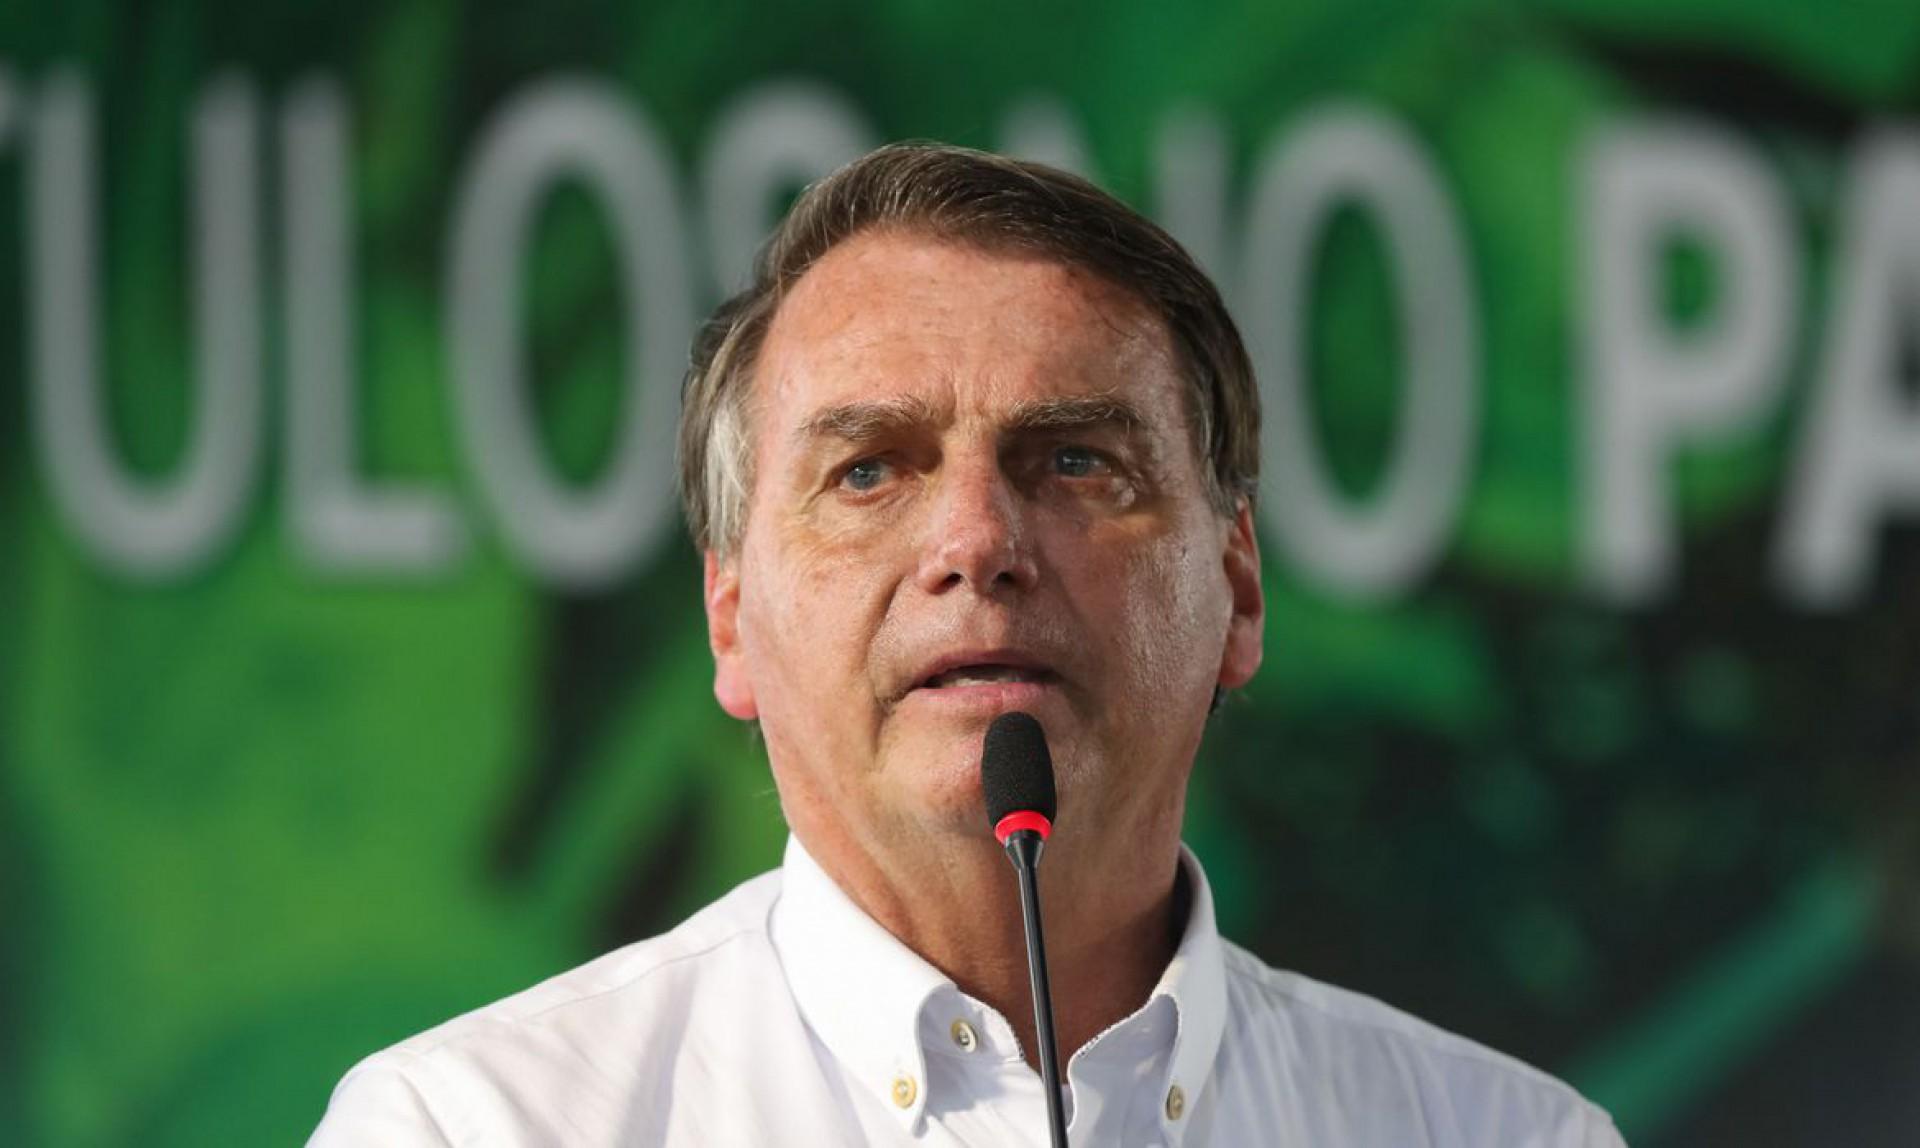 Presidente Jair Bolsonaro em visita ao Paraná (Foto: Isac Nóbrega/PR)